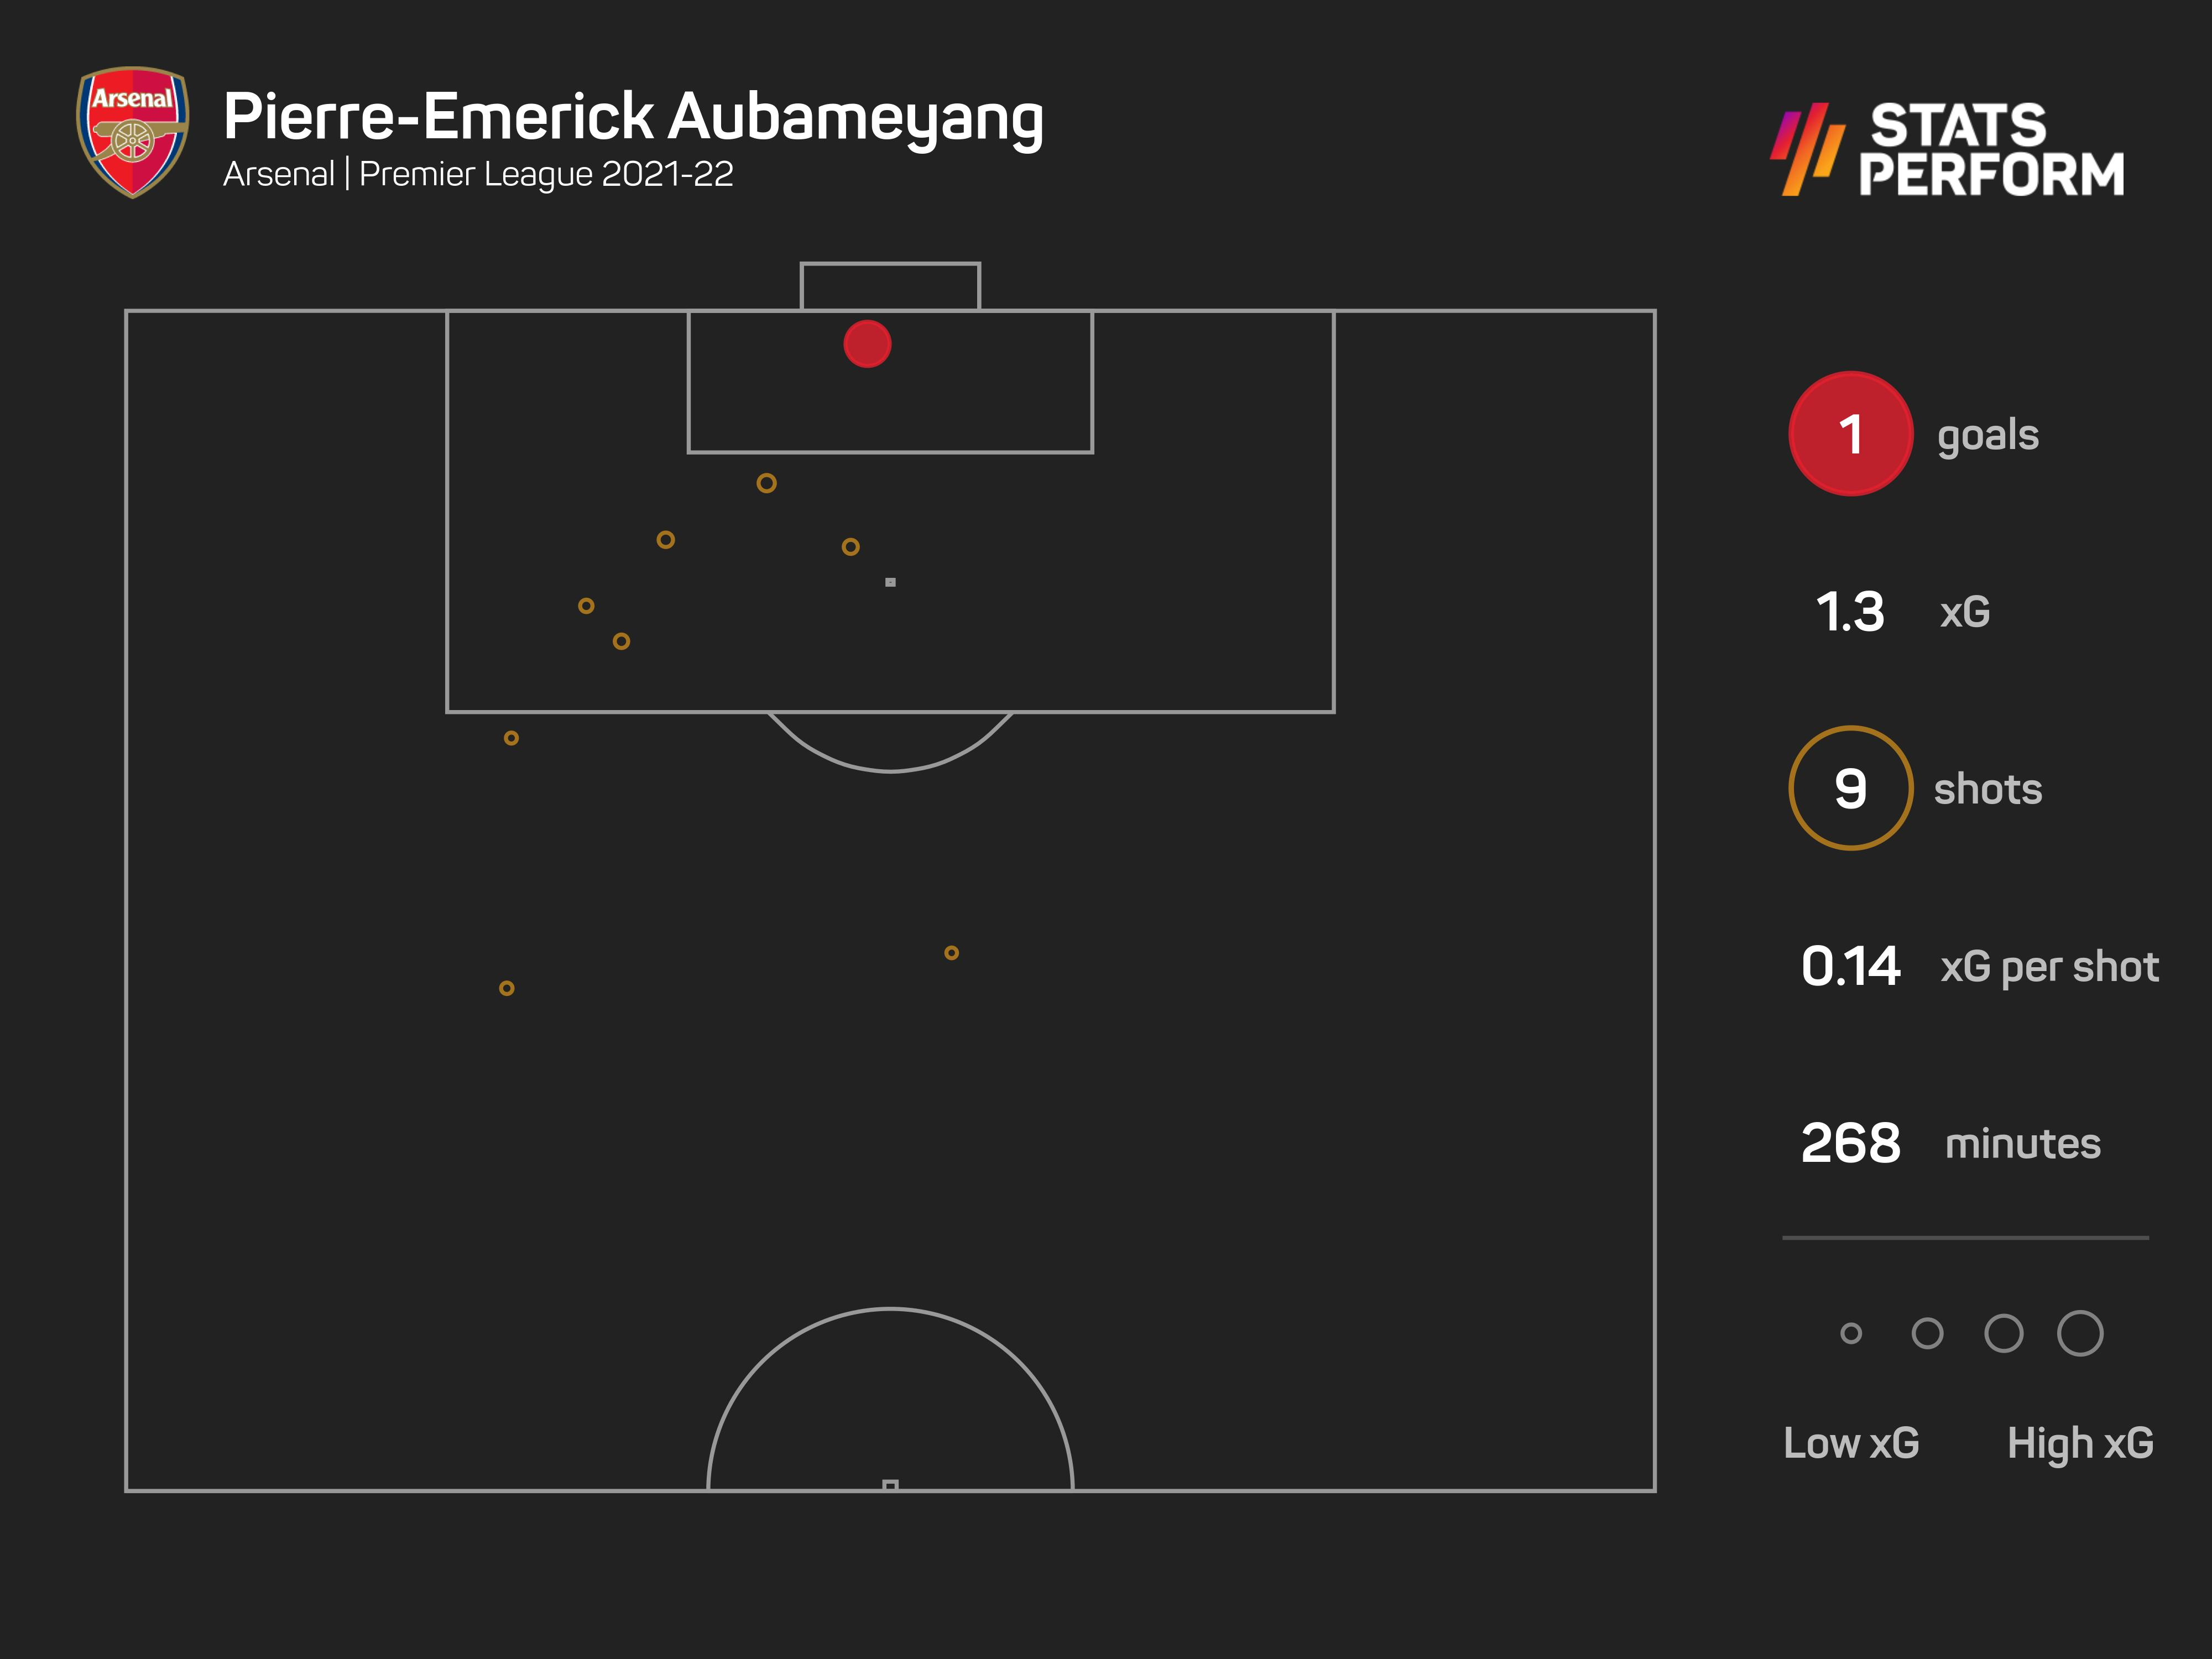 Pierre-Emerick Aubameyang shots 2021-22